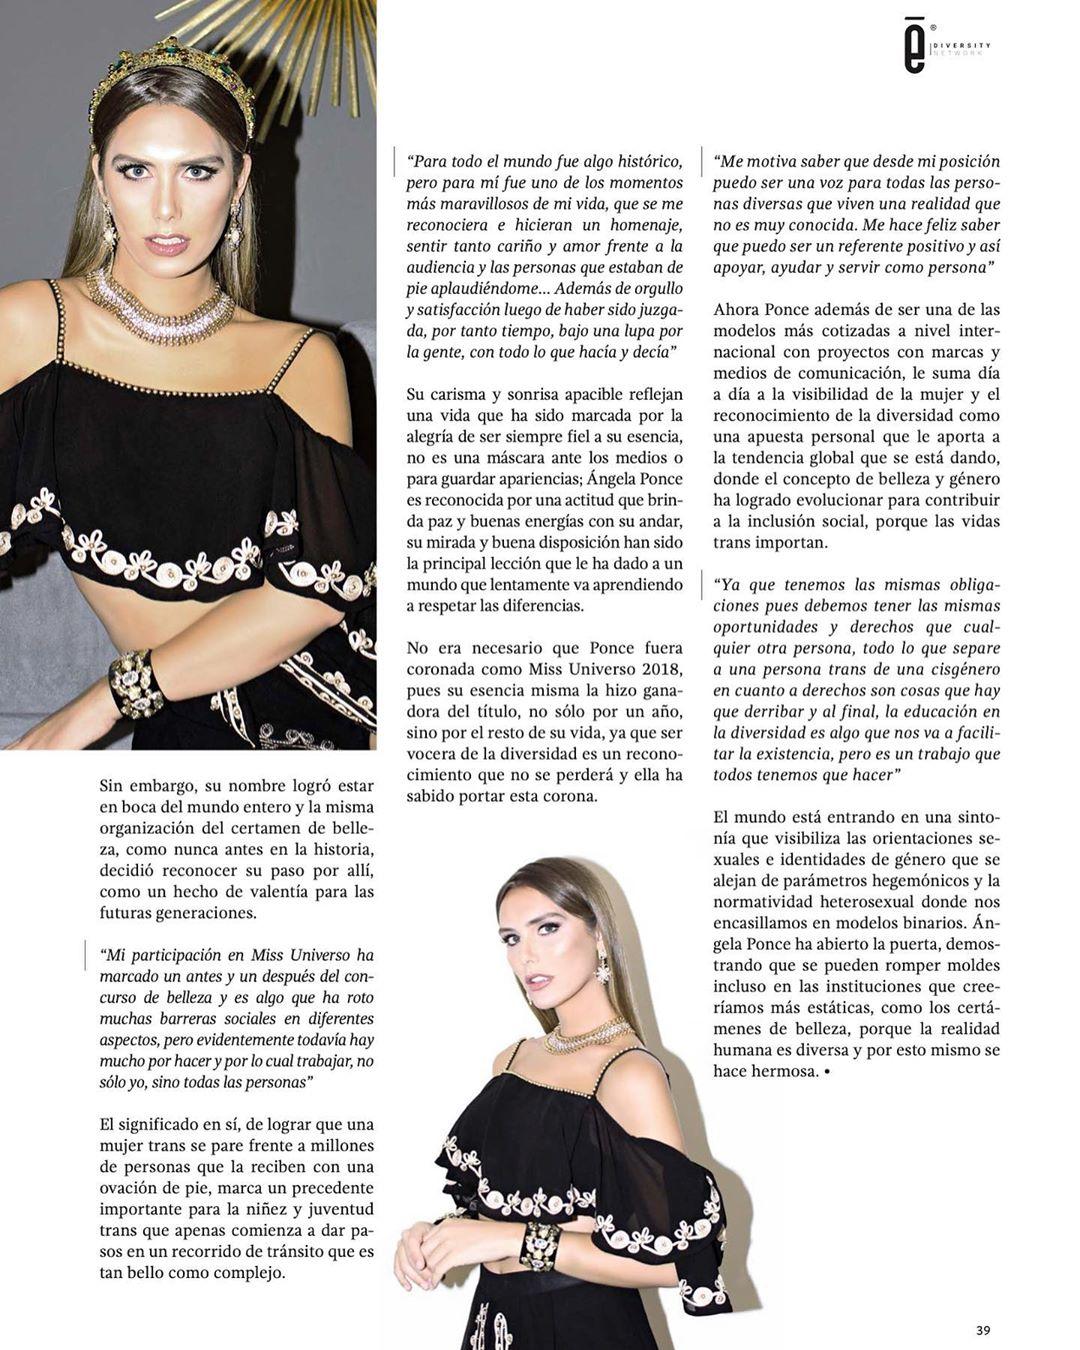 angela ponce, miss espana universo 2018. - Página 20 73420522